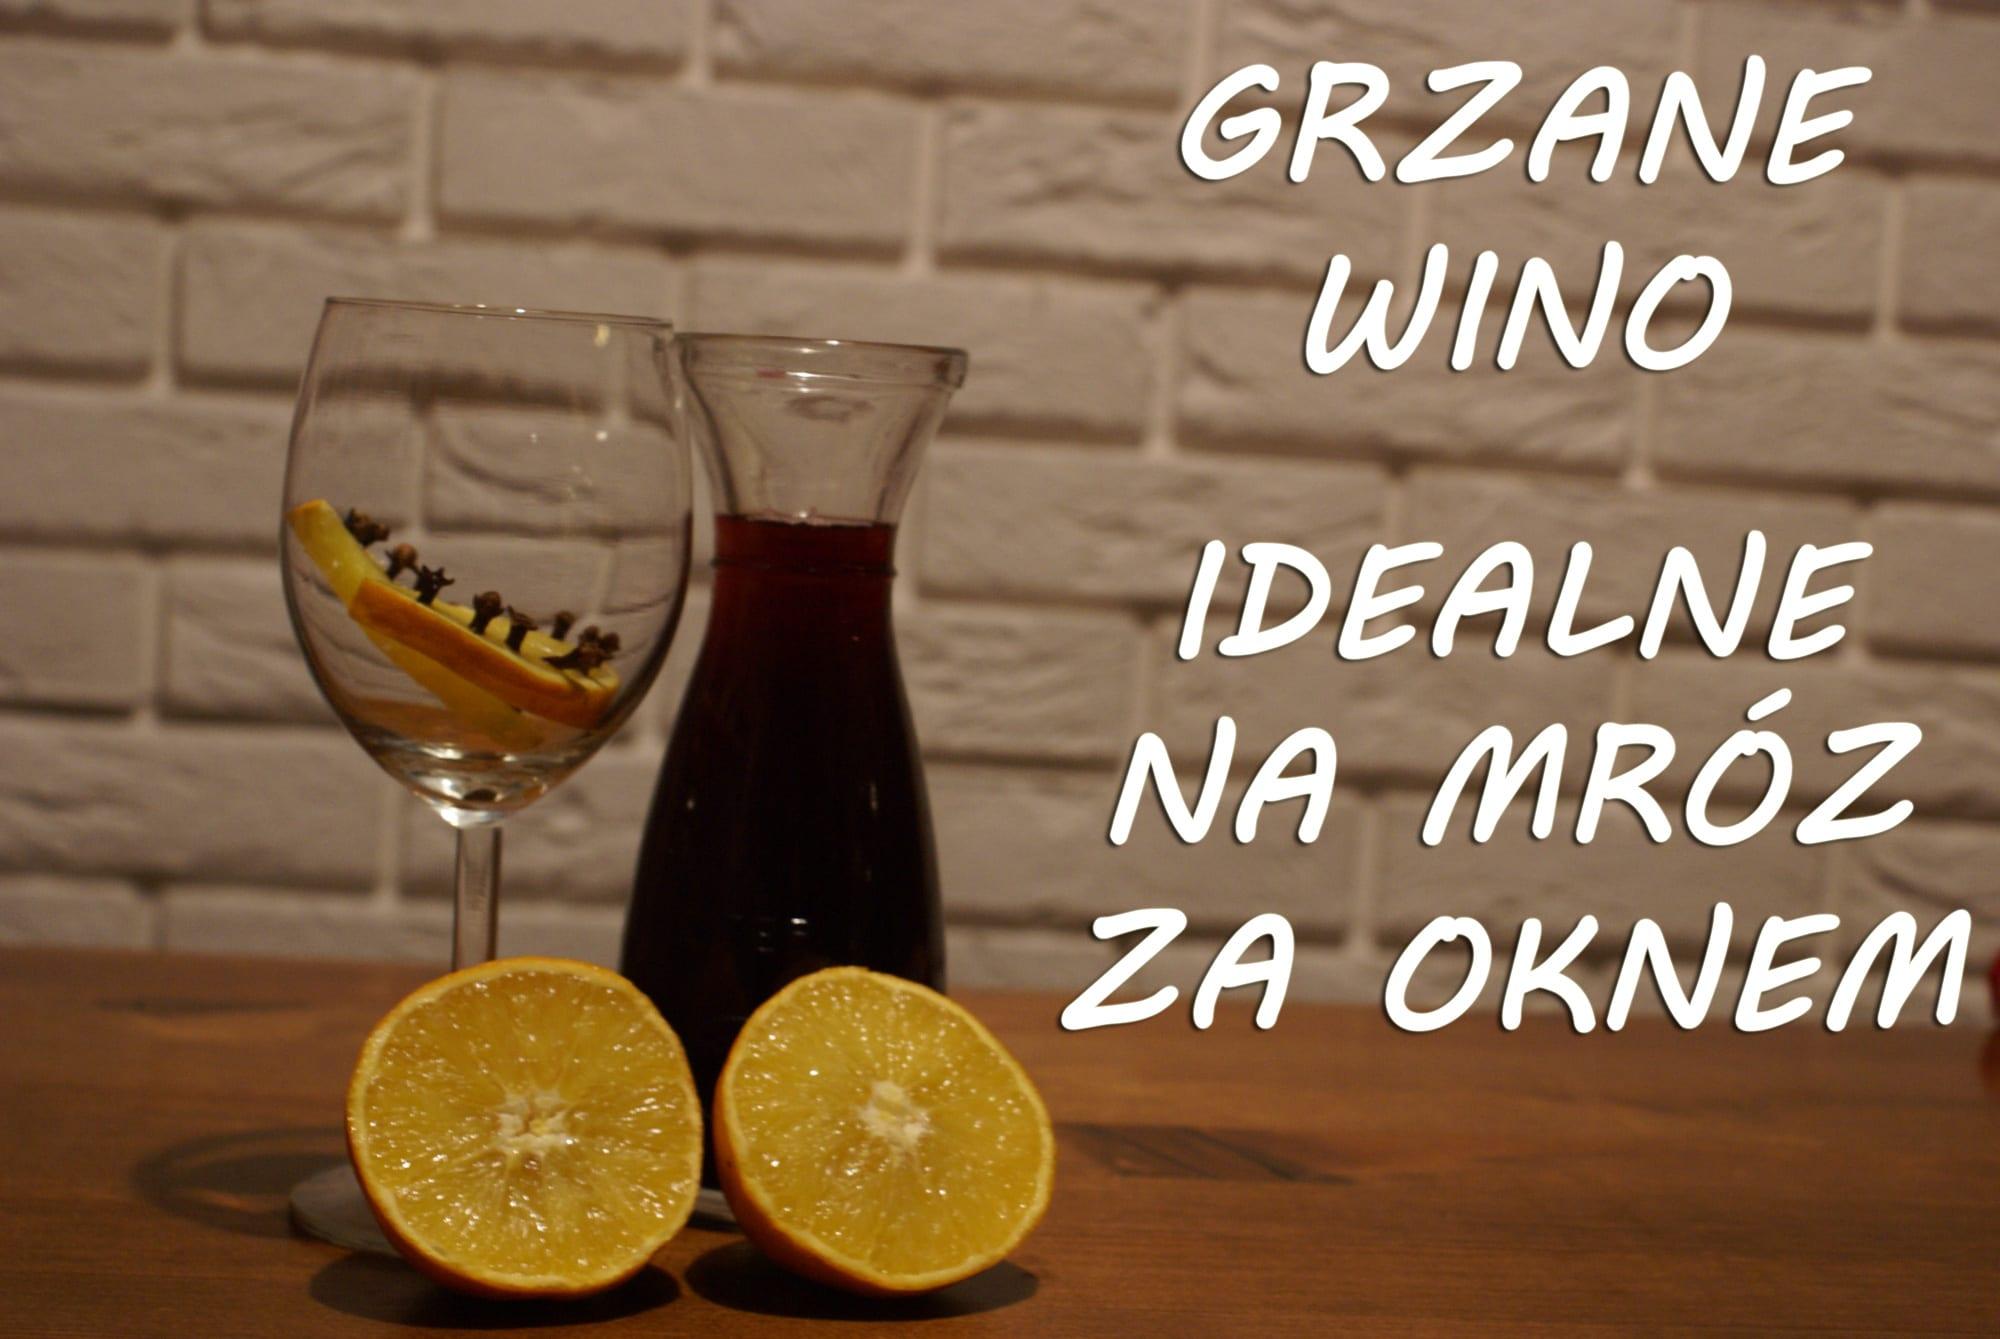 Grzane wino - idealne na mróz za oknem